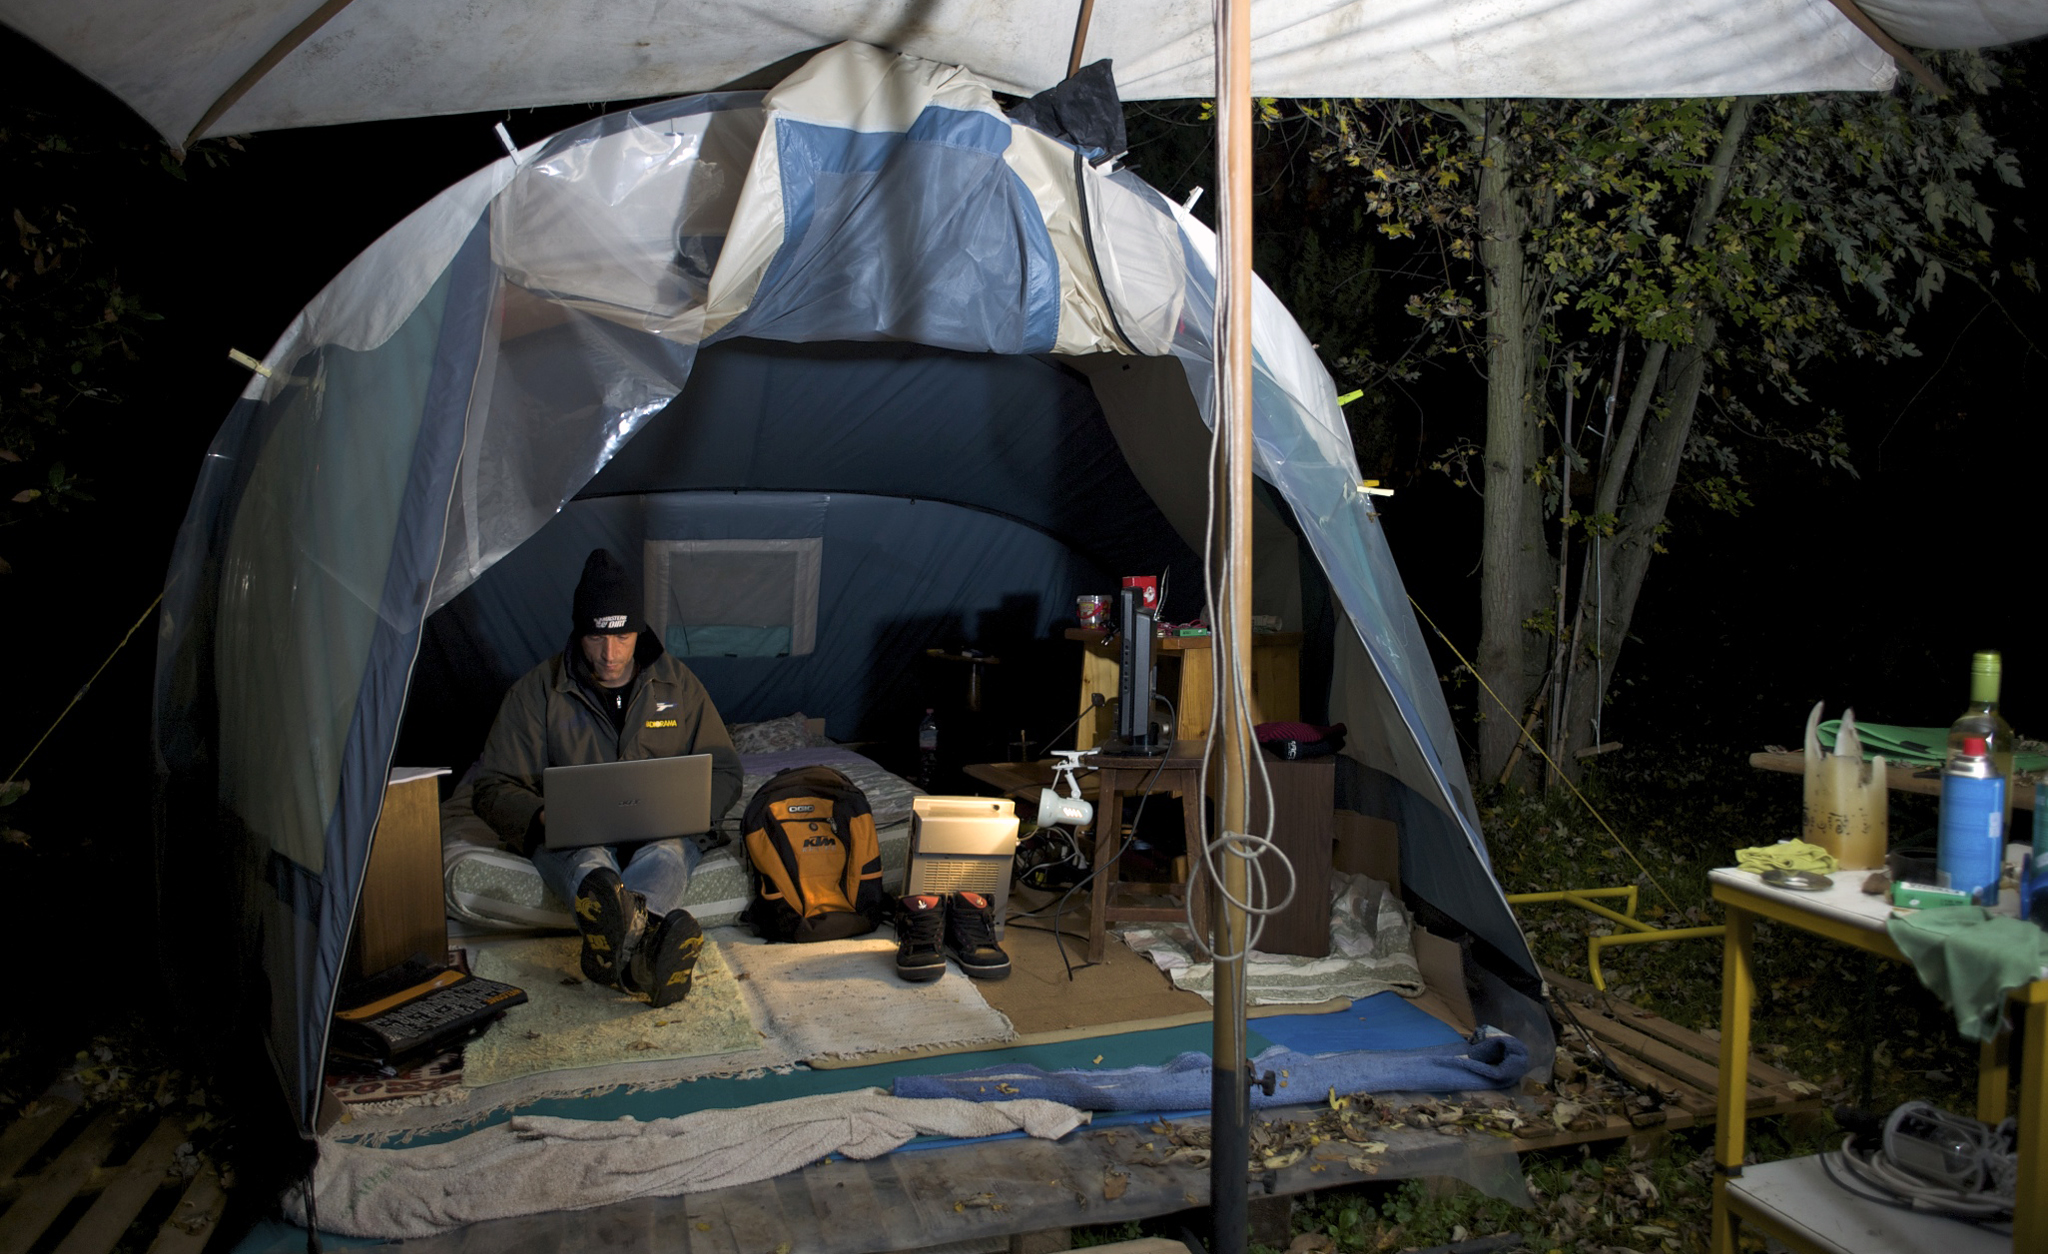 Lorenzo Magnoni's Tent